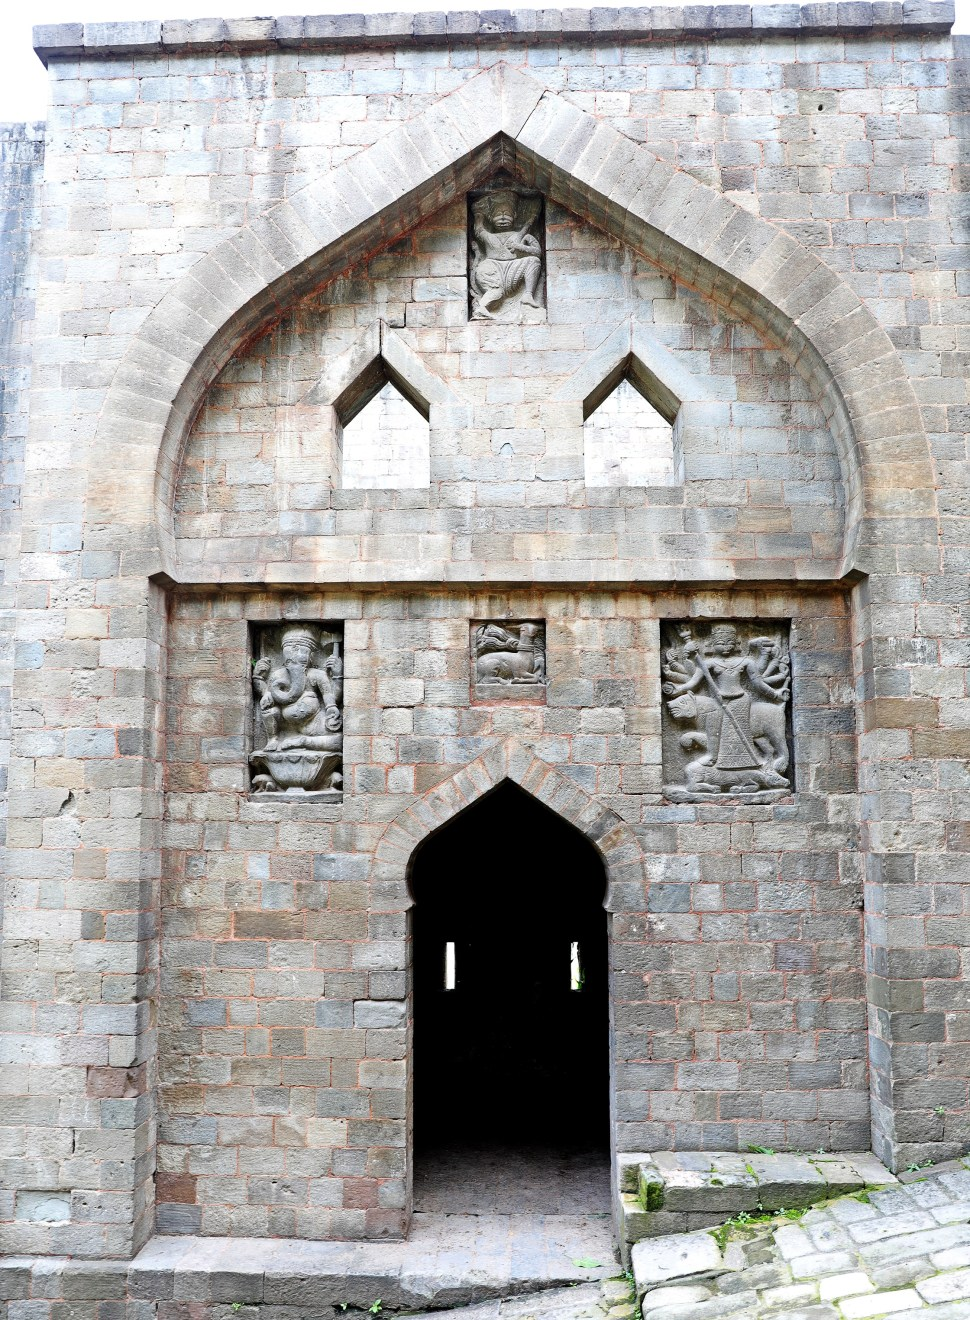 One of the gates of Kangra Fort, Himachal Pradesh